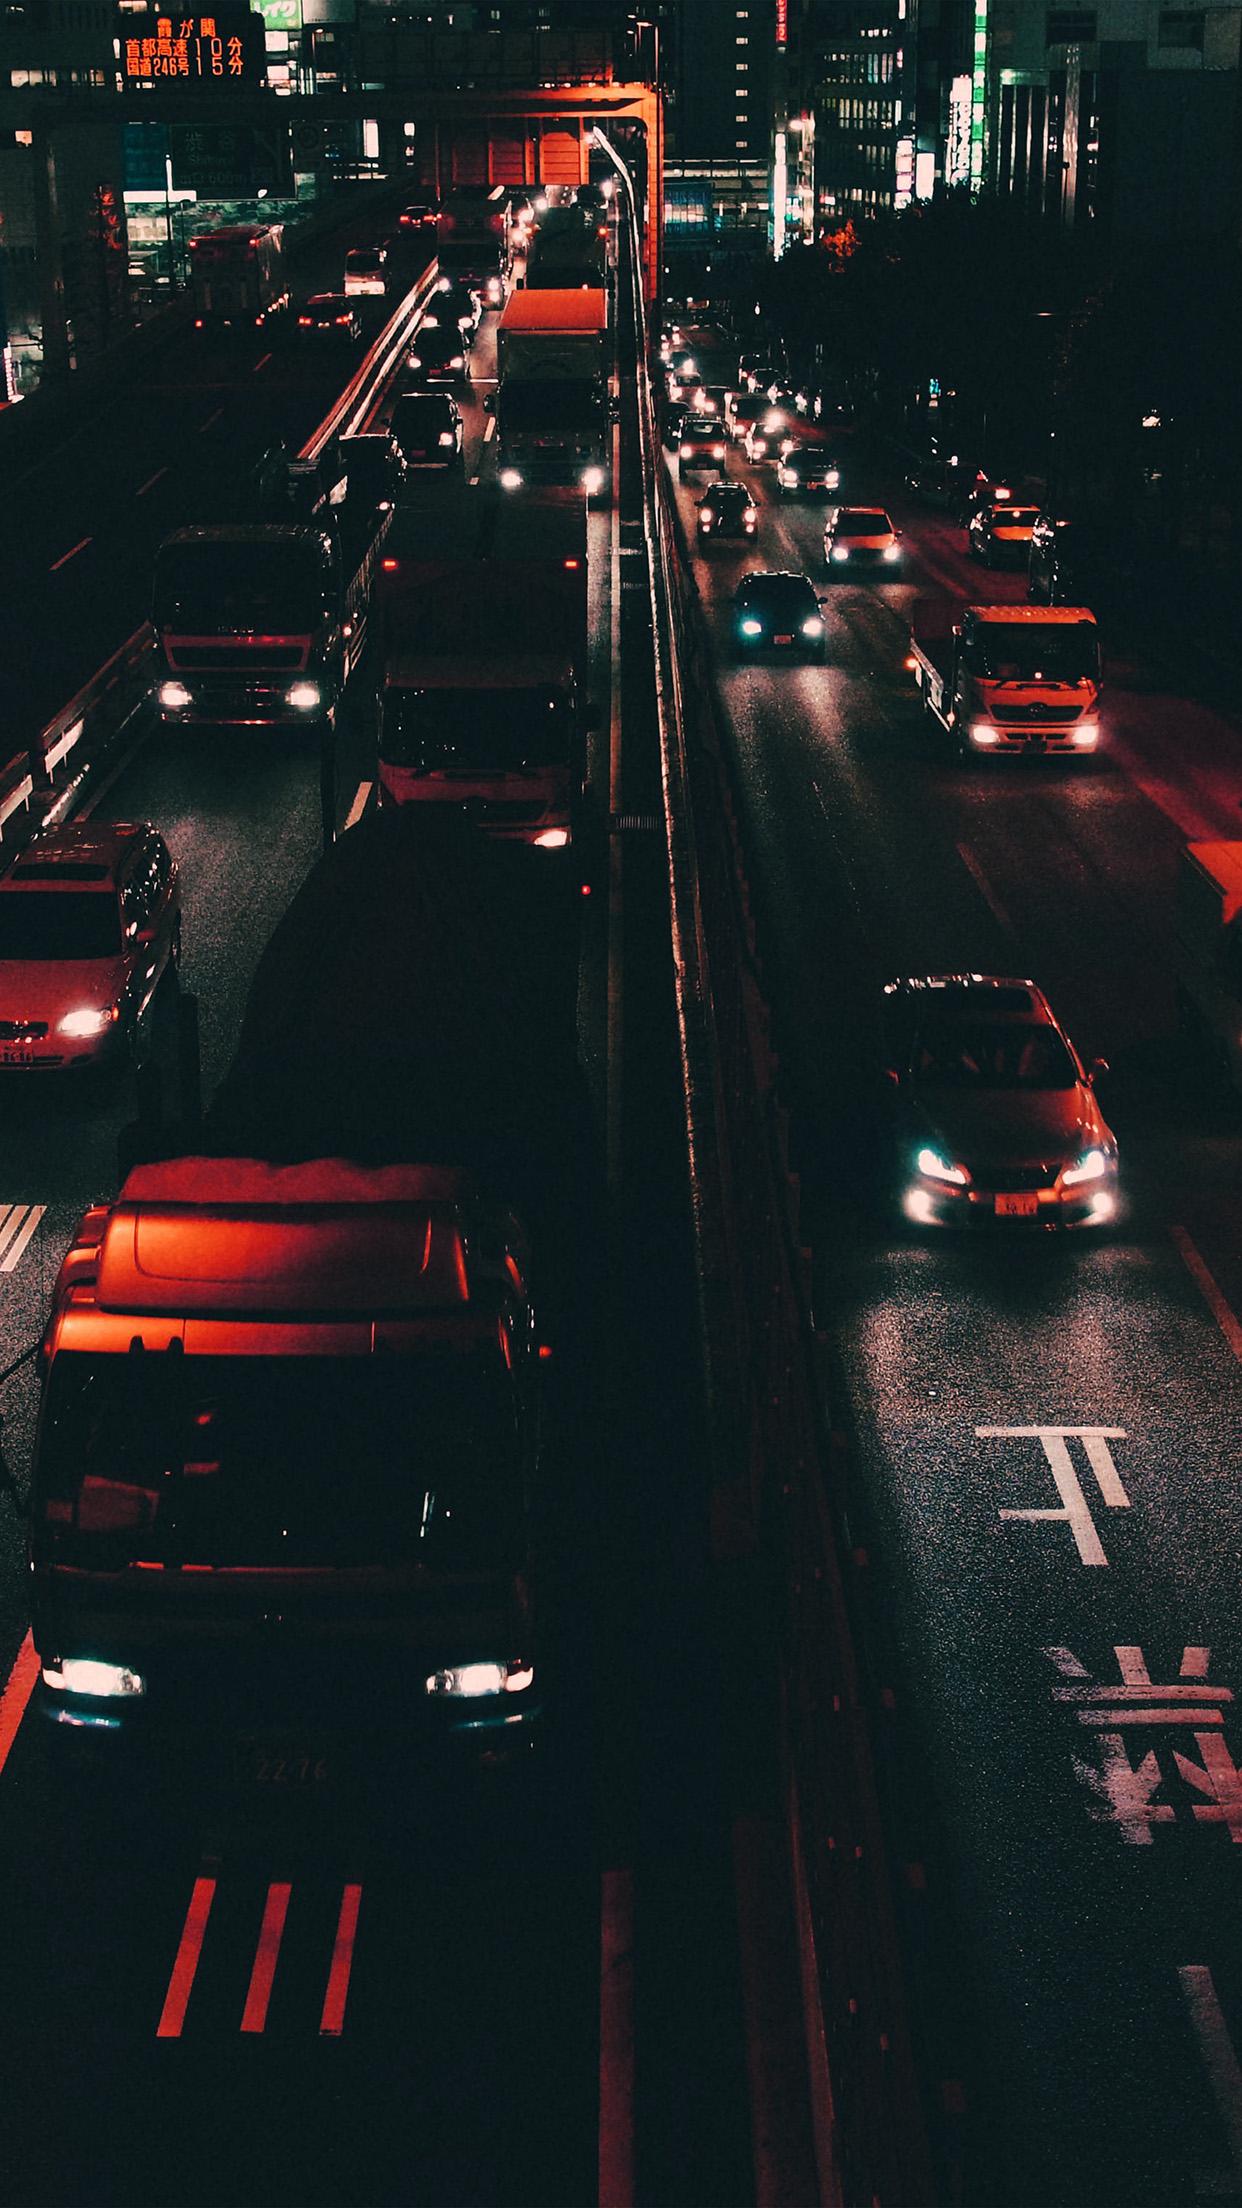 Download 4k wallpapers of cars like lamborghini, ferrari, bmw, audi, porsche, bentley, bugatti, aston martin, mclaren, mercedes benz in hd, 4k, 5k resolutions for desktop & Nk70 Street Car Japan Night Orange Wallpaper